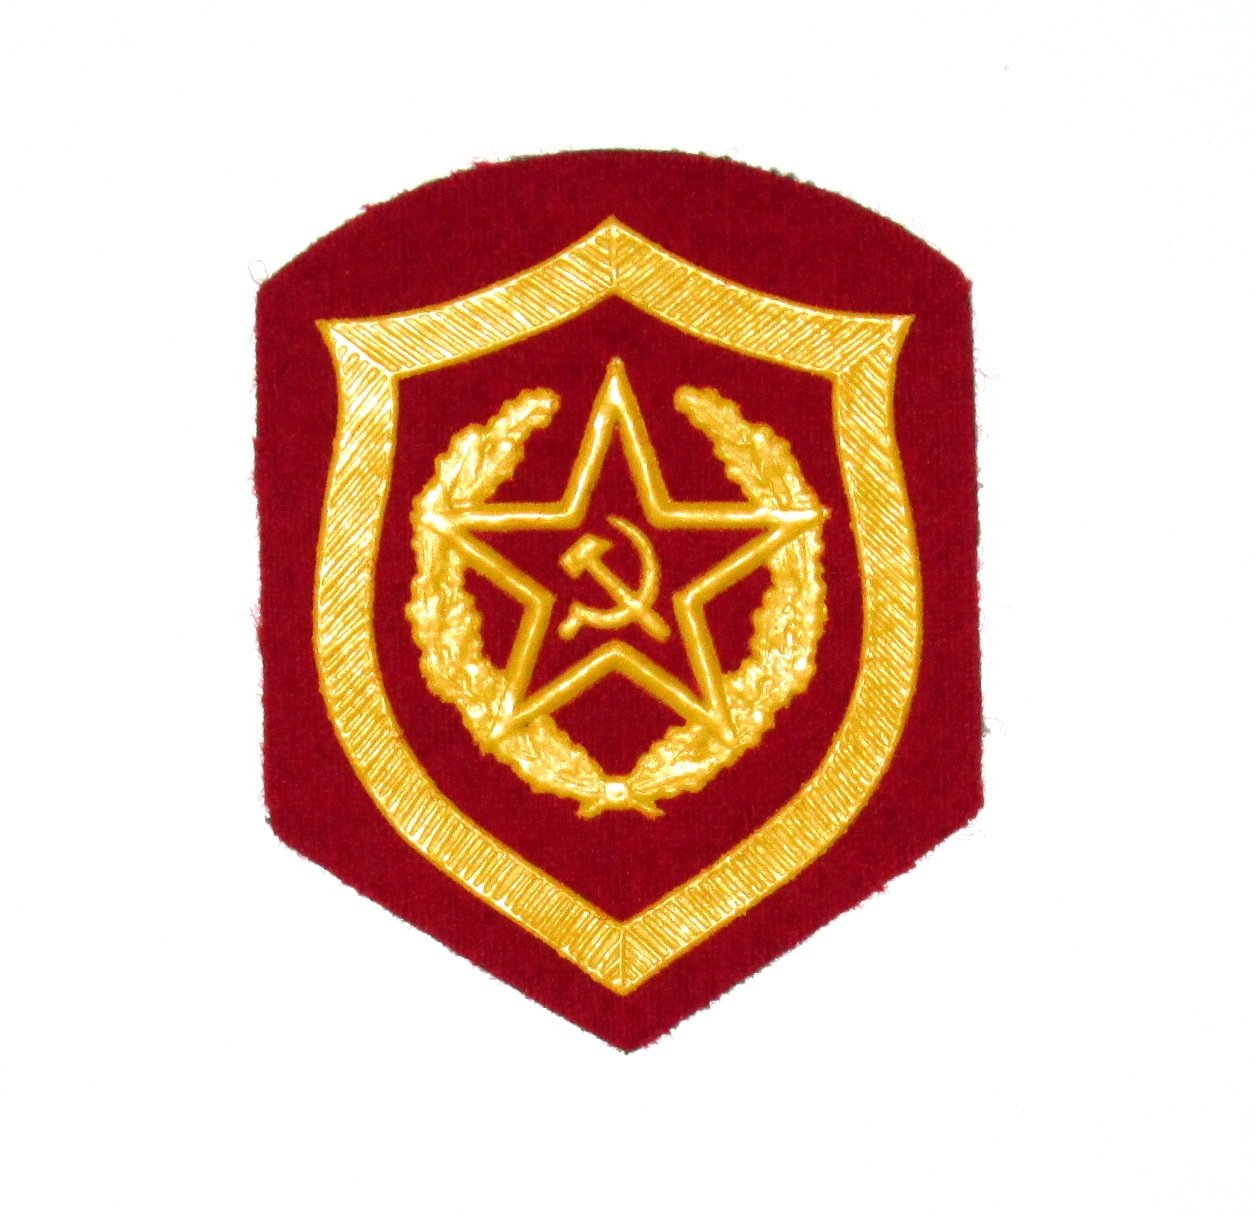 100% Original USSR - Soviet Russian Military Uniform Patch - Motor Rifle -